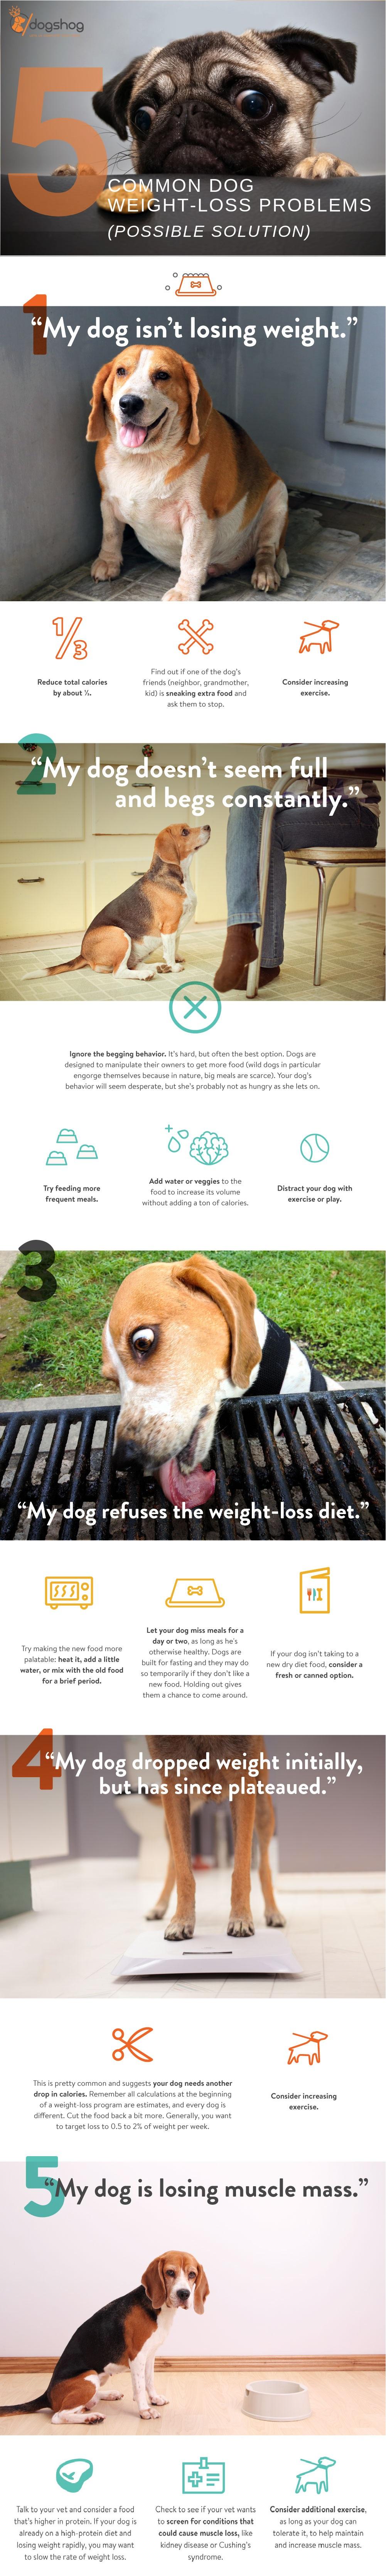 dog-weight-loss-chart, dog-weight-loss-chart information